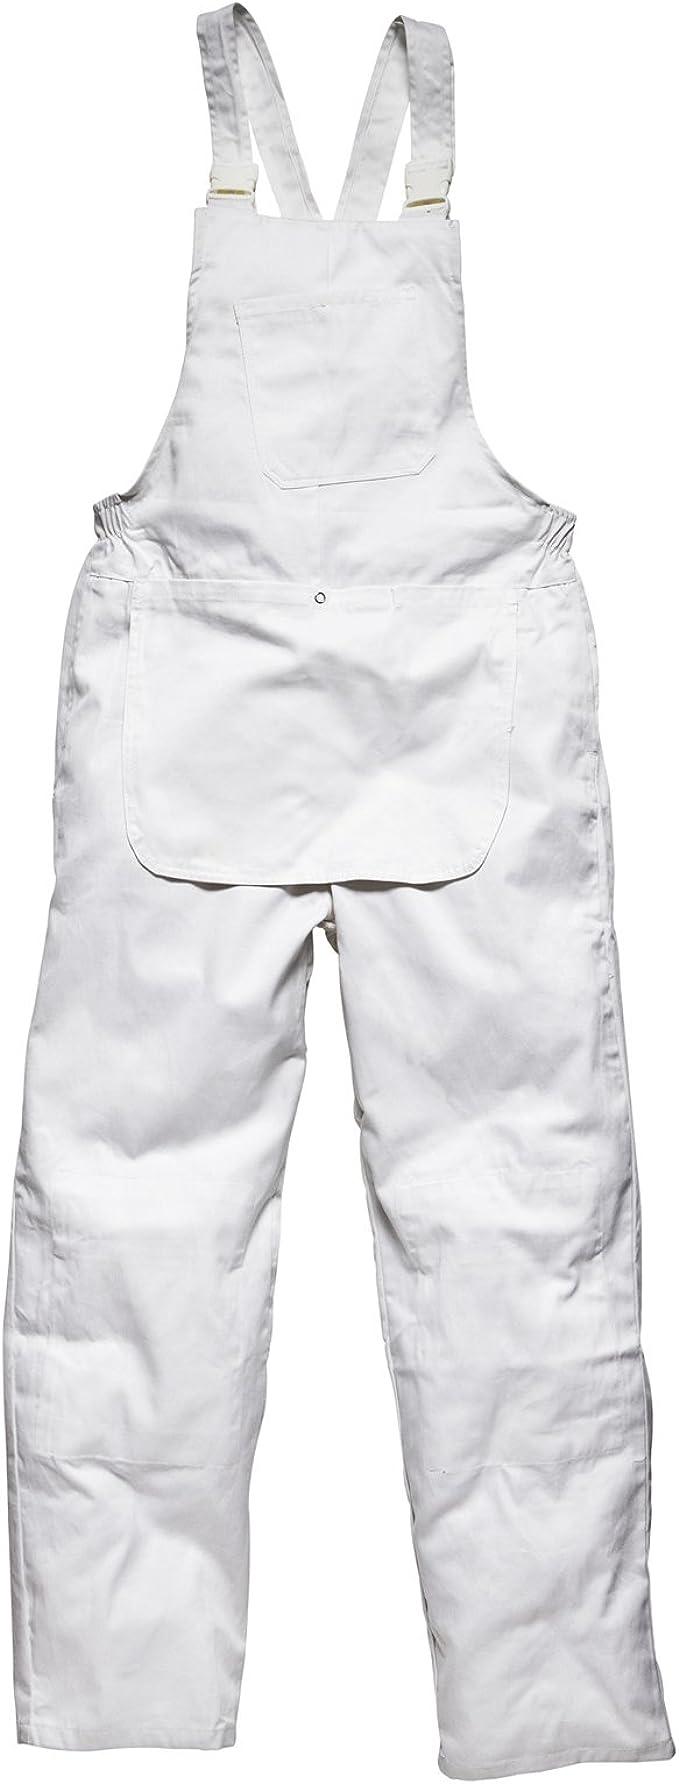 White Painters Shorts Decorators Workwear S 2XL